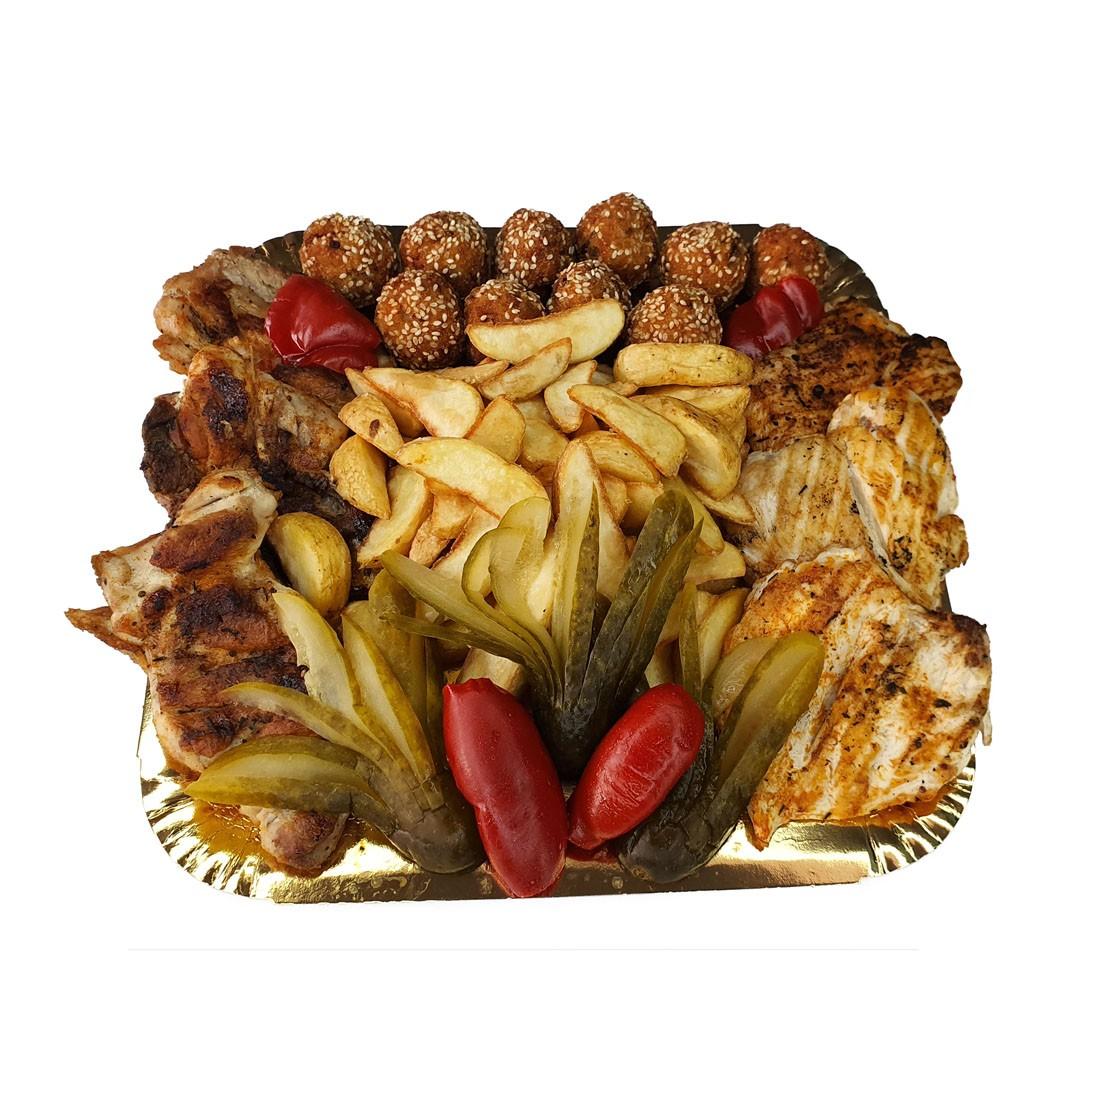 Platou 6 gratar pui - contine: pulpa de pui dezosata la gratar, chiftelute de pui cu susan, piept de pui la gratar, cartofi wedges, castraveti in otet si gogosari in otet